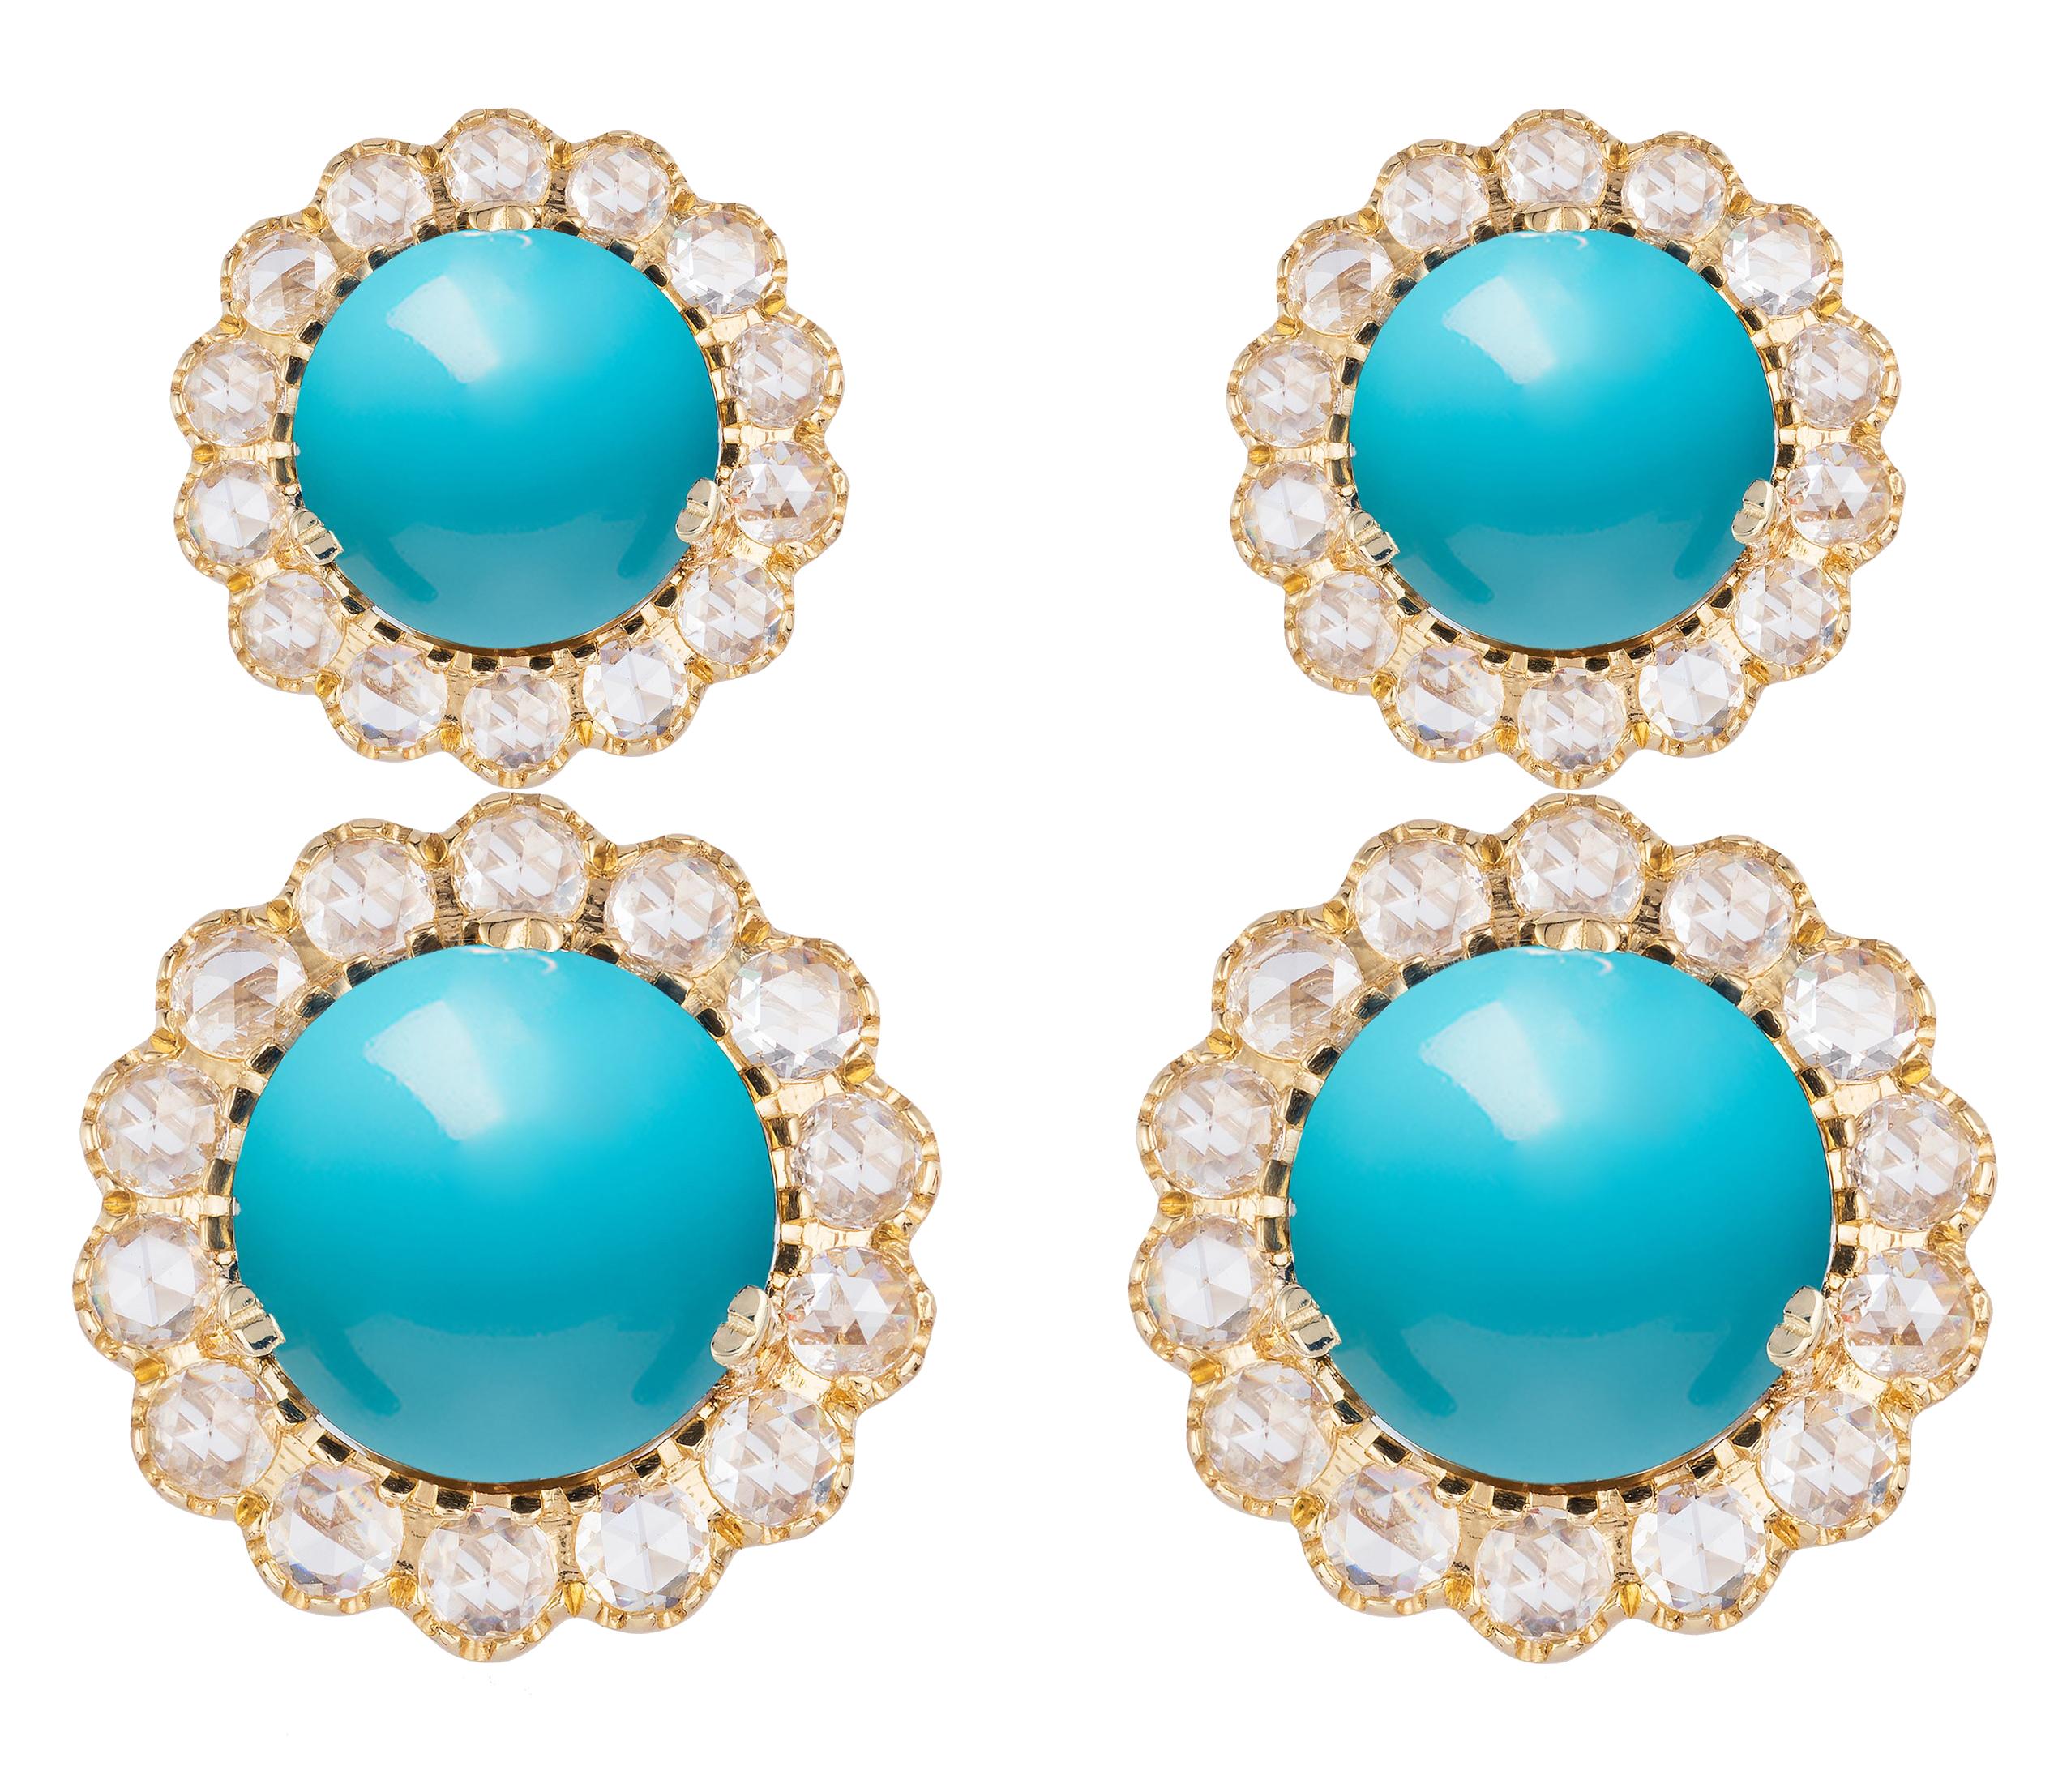 turquoise-and-diamond-earrings-667e